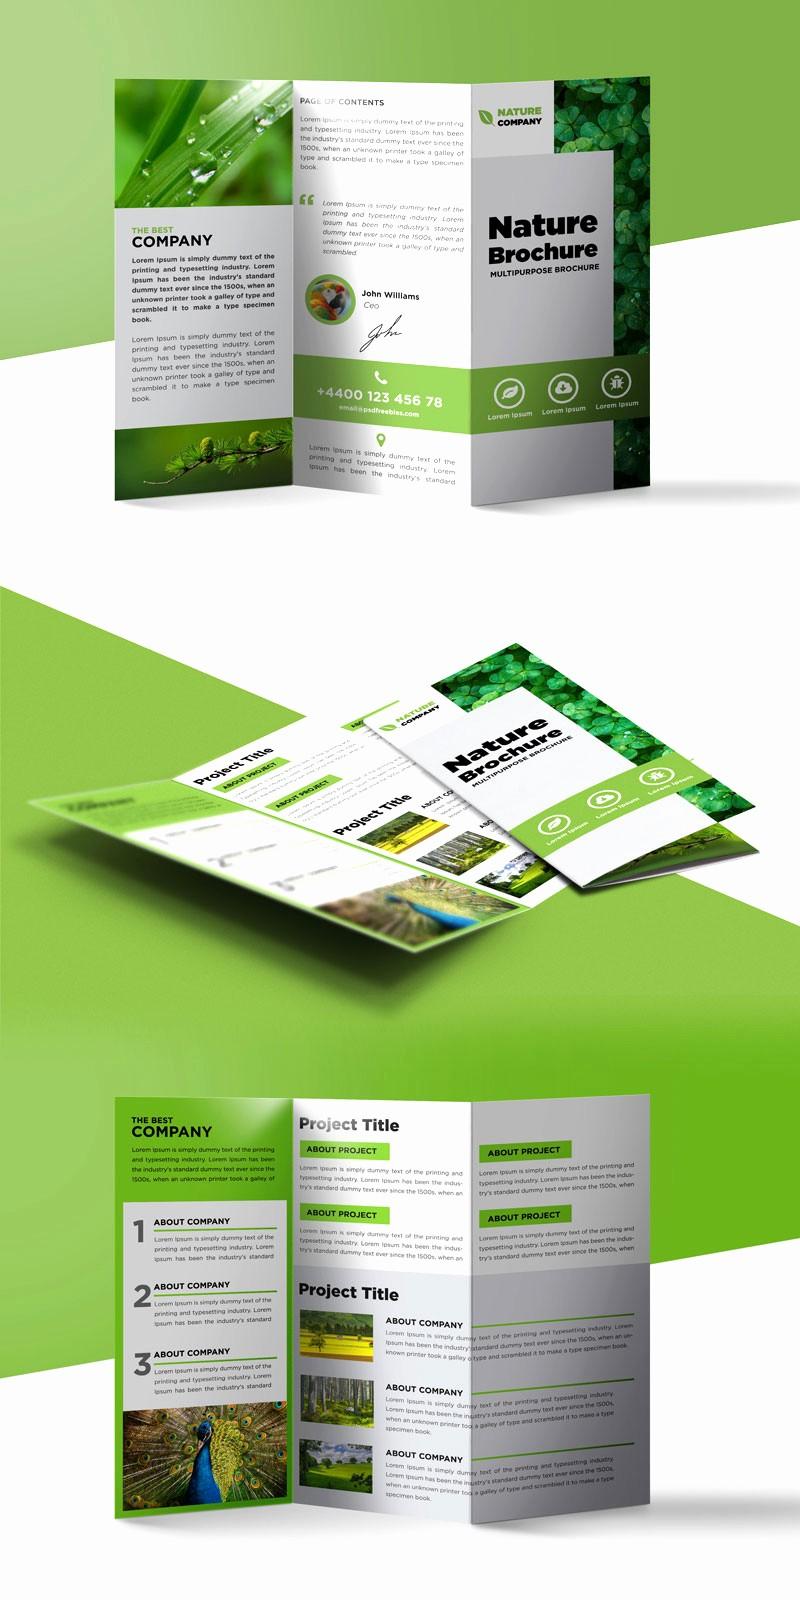 Printable Tri Fold Brochure Template Best Of Nature Tri Fold Brochure Template Free Psd